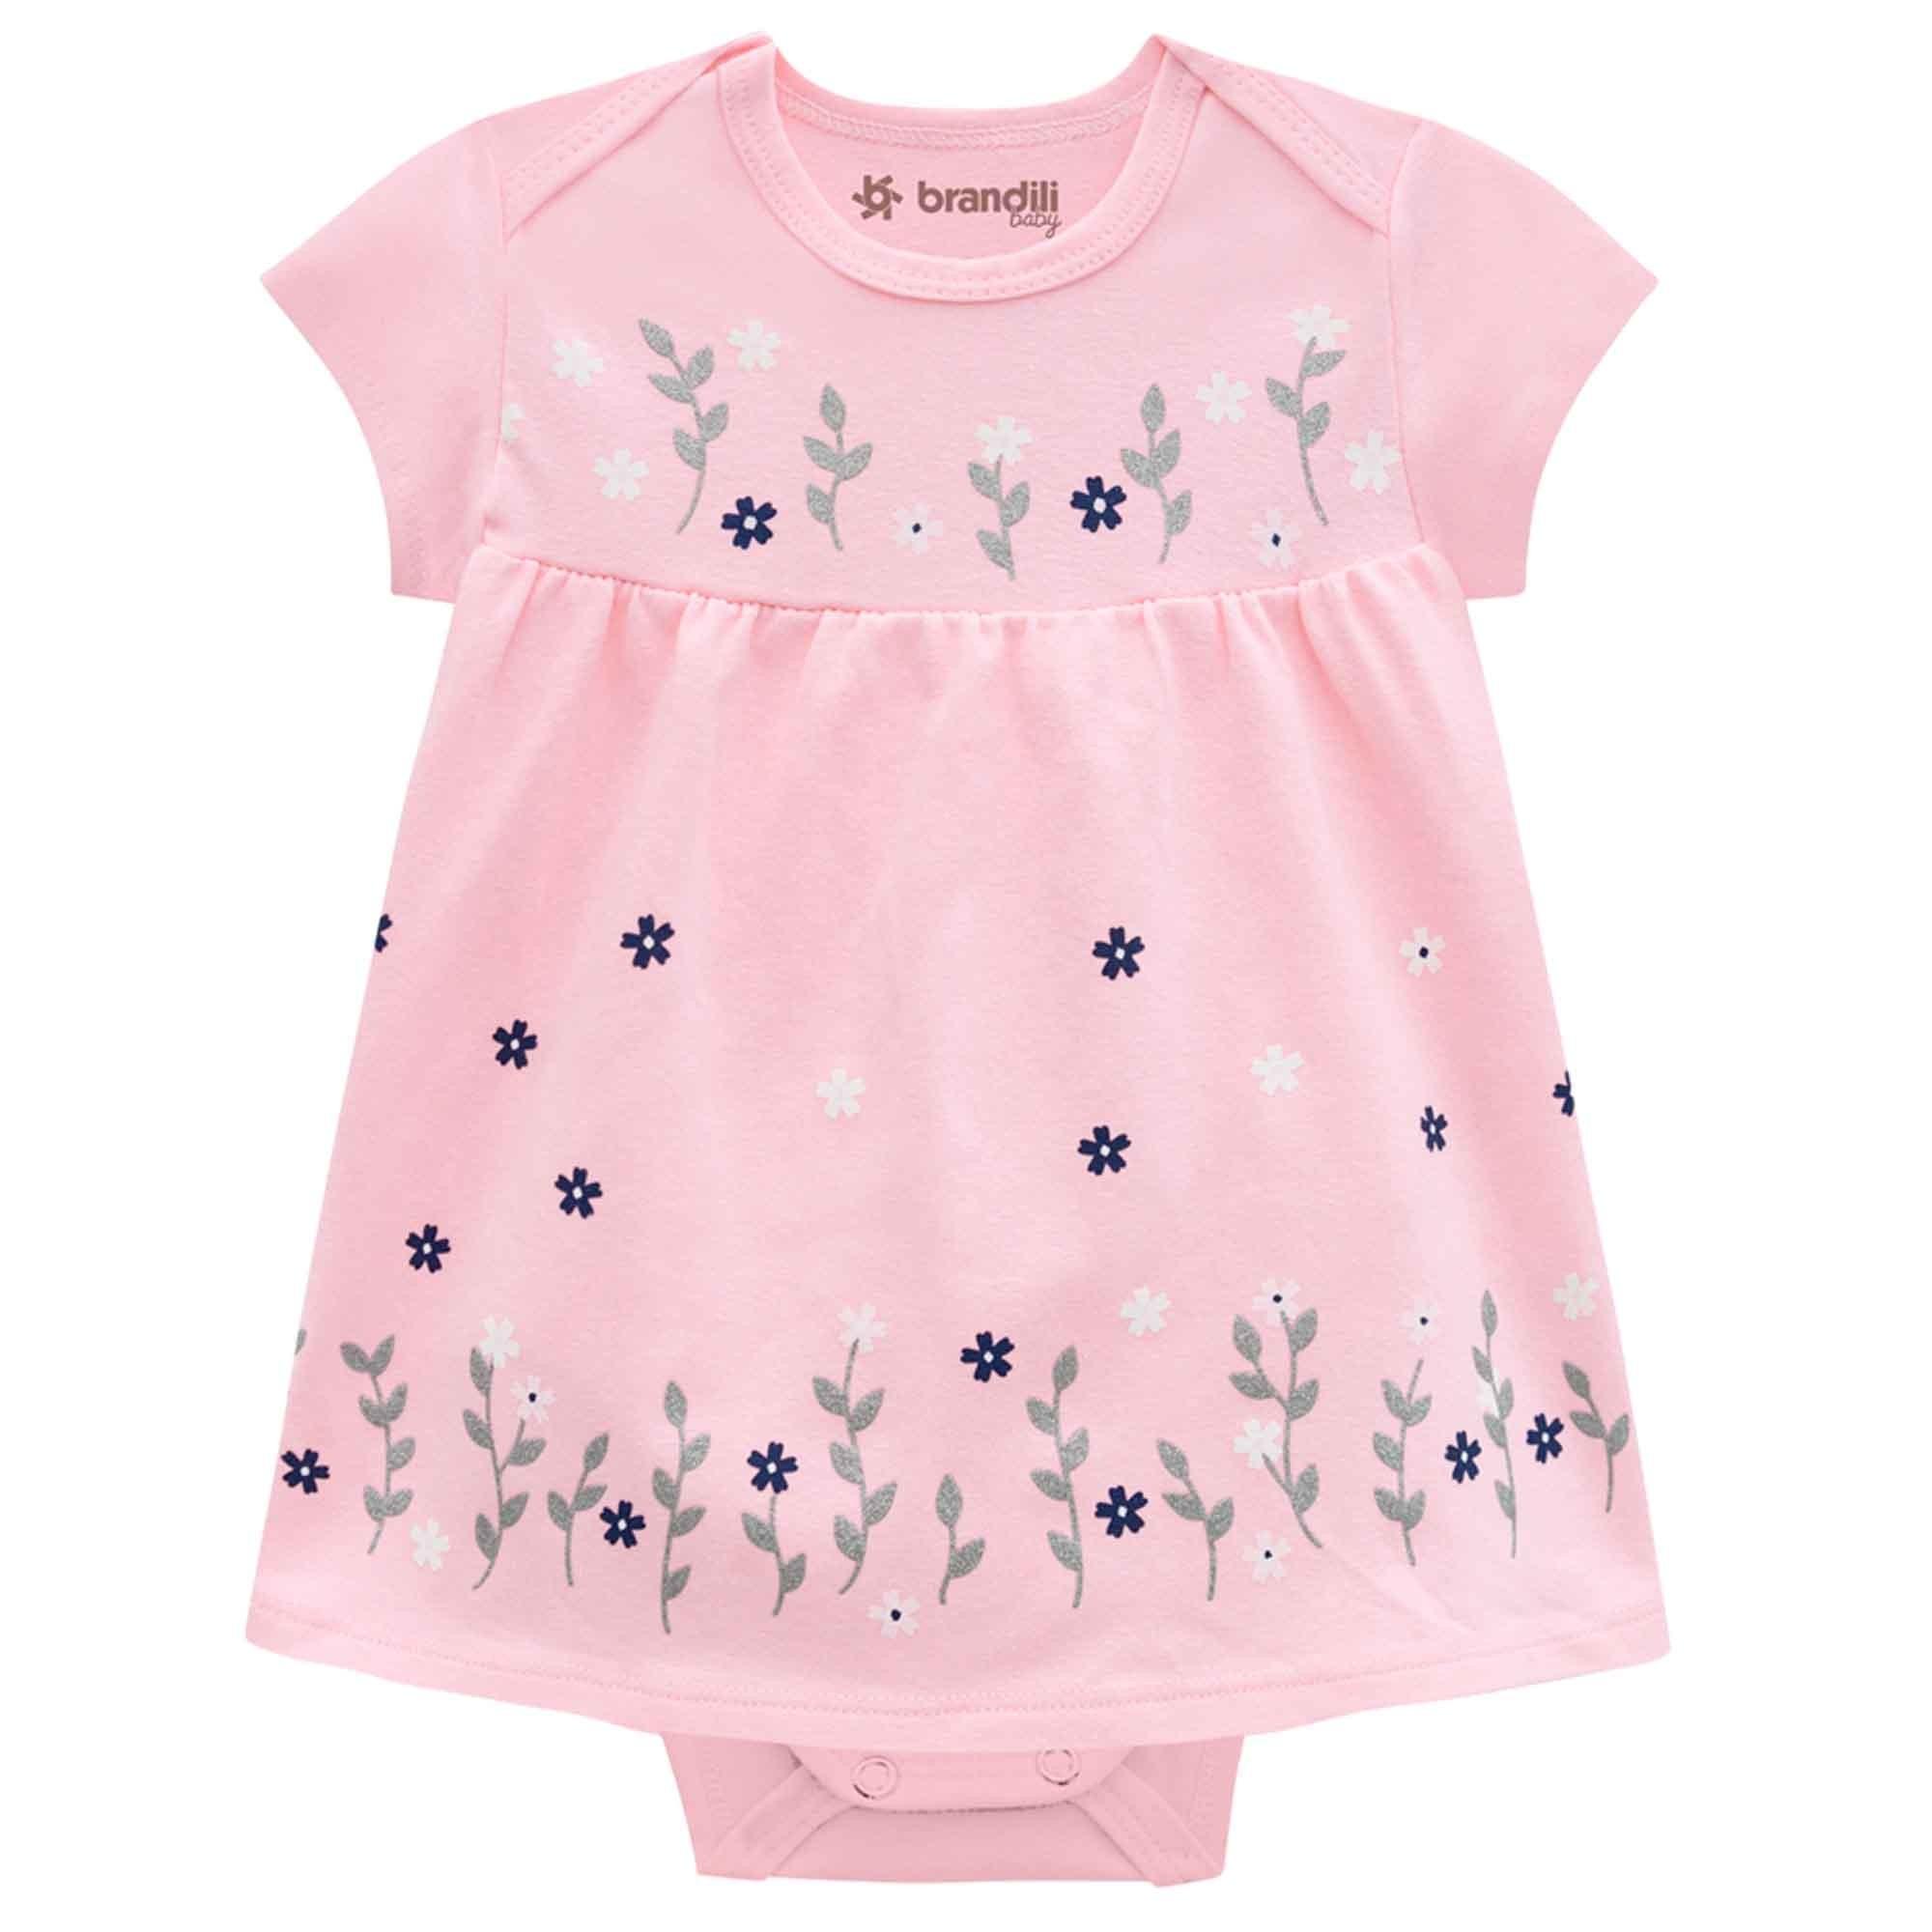 Body Vestido Meia Manga Brandili Baby Flores - RN ao G